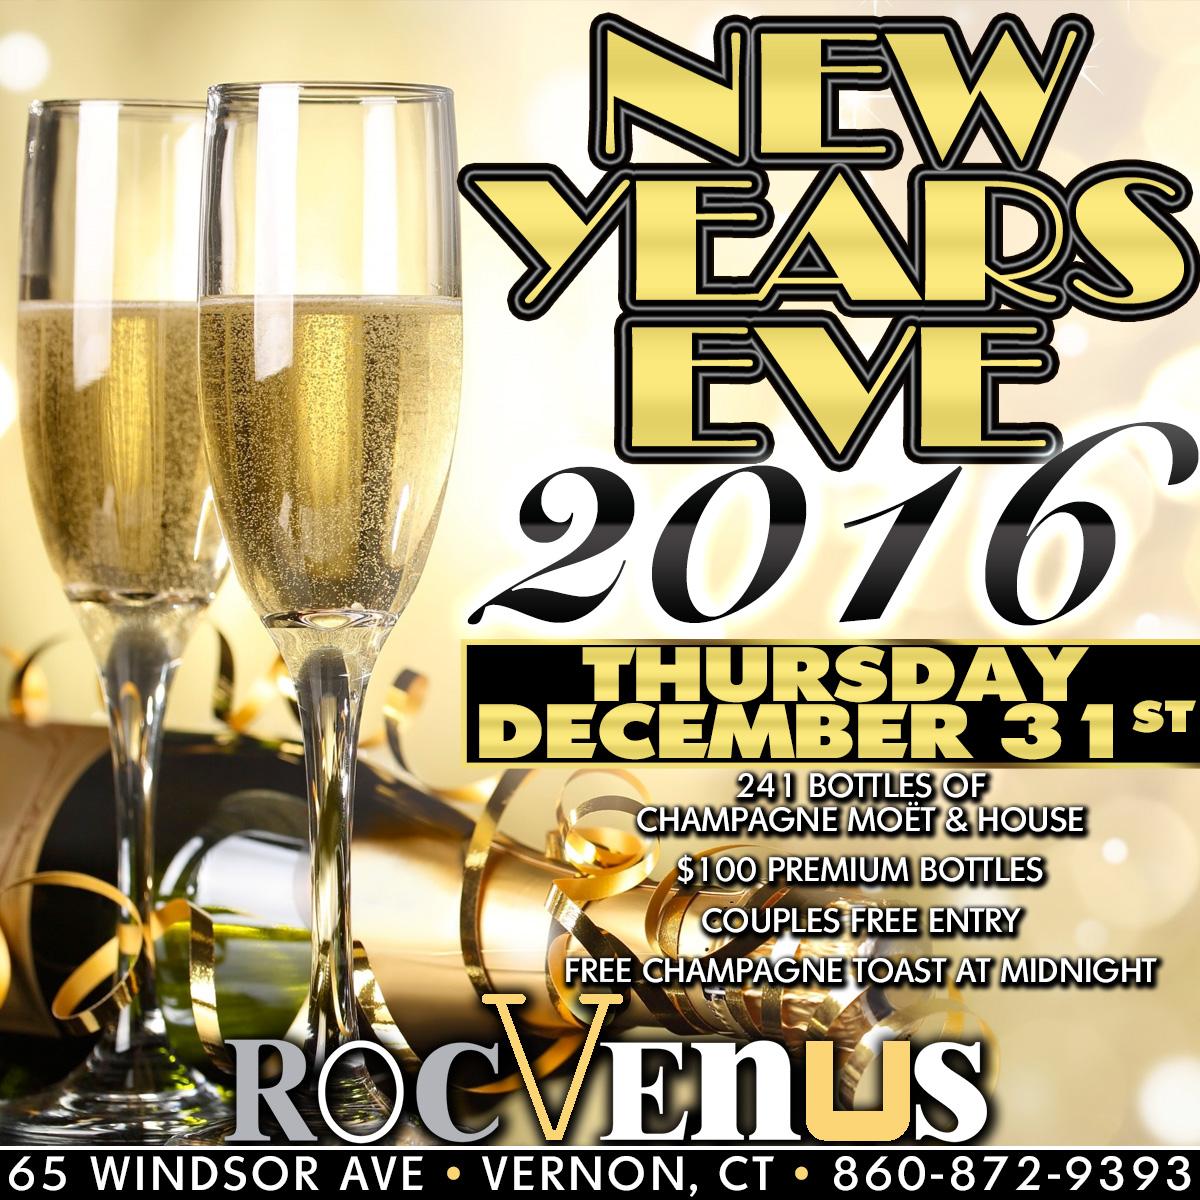 New Years Eve | RocVenus Strip Club Connecticut CT